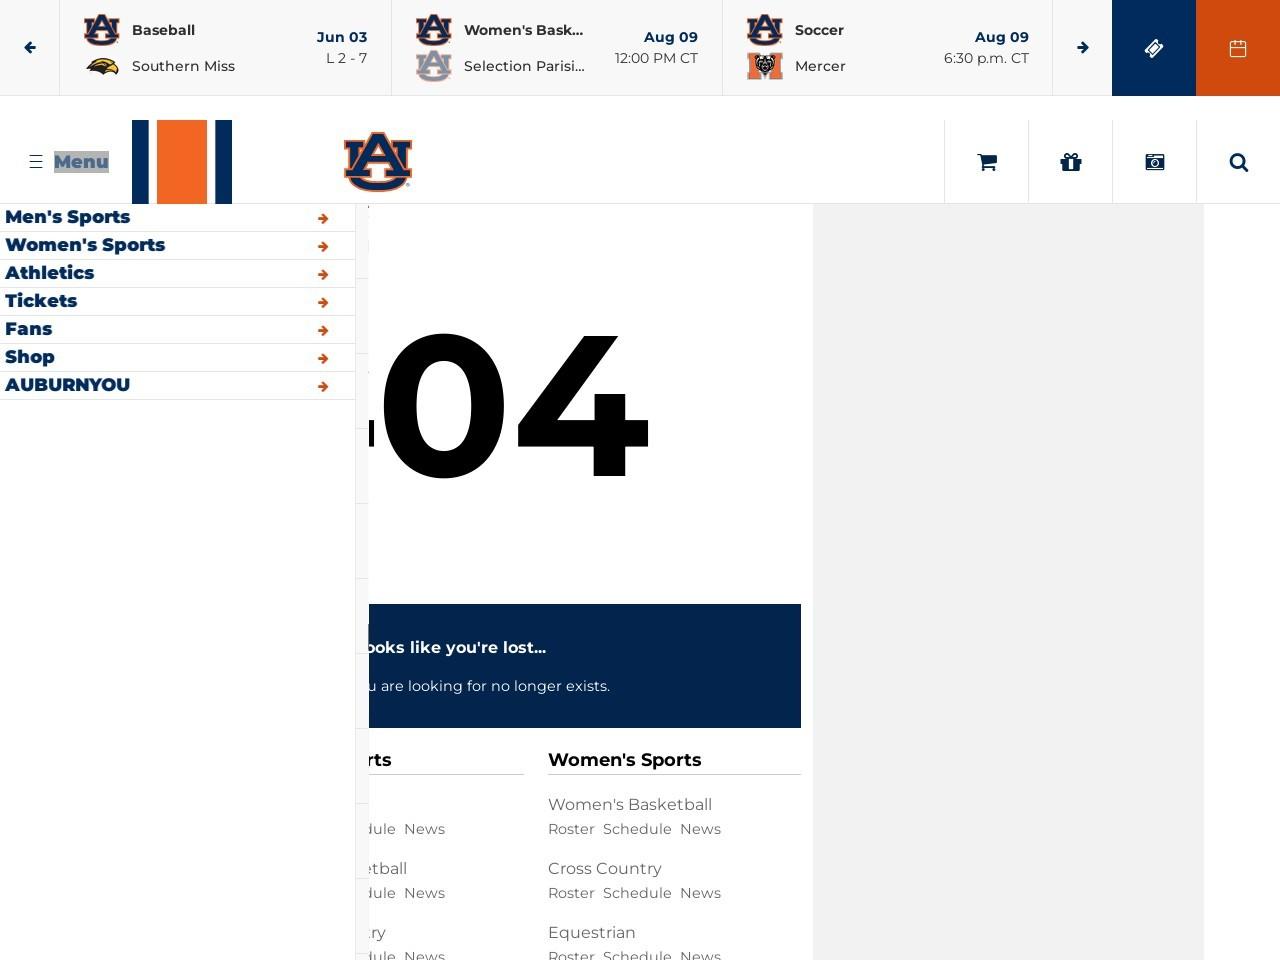 'Really battling': Auburn falls, but wins weekend series